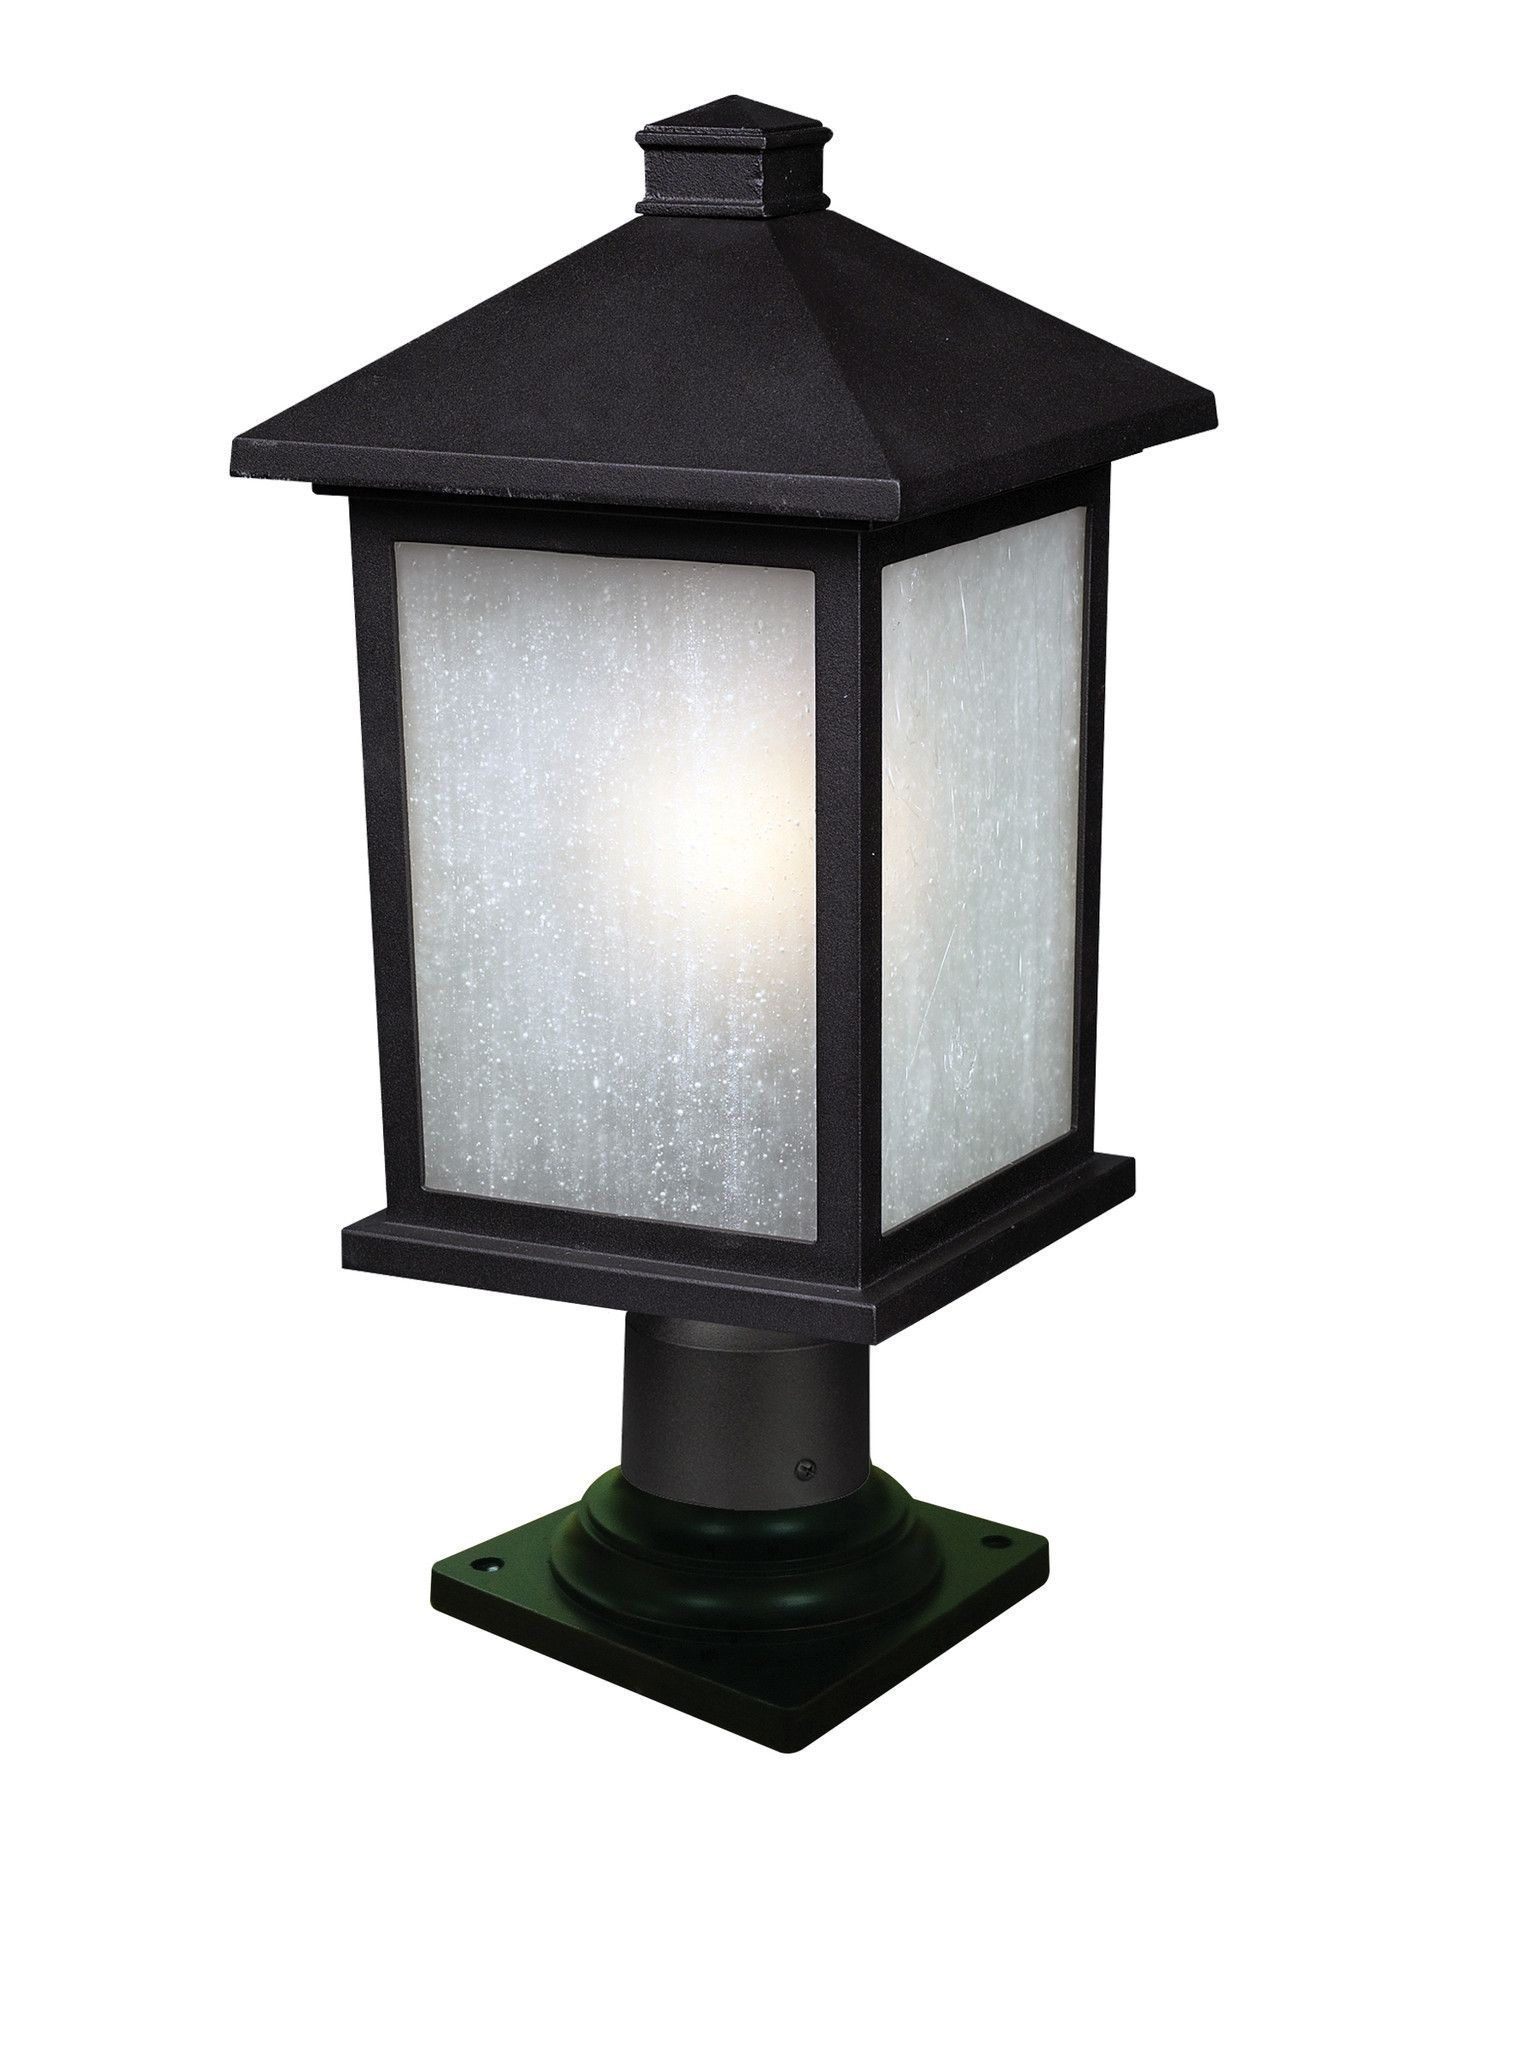 Zlite phbpmbk holbrook light outdoor pier mount light